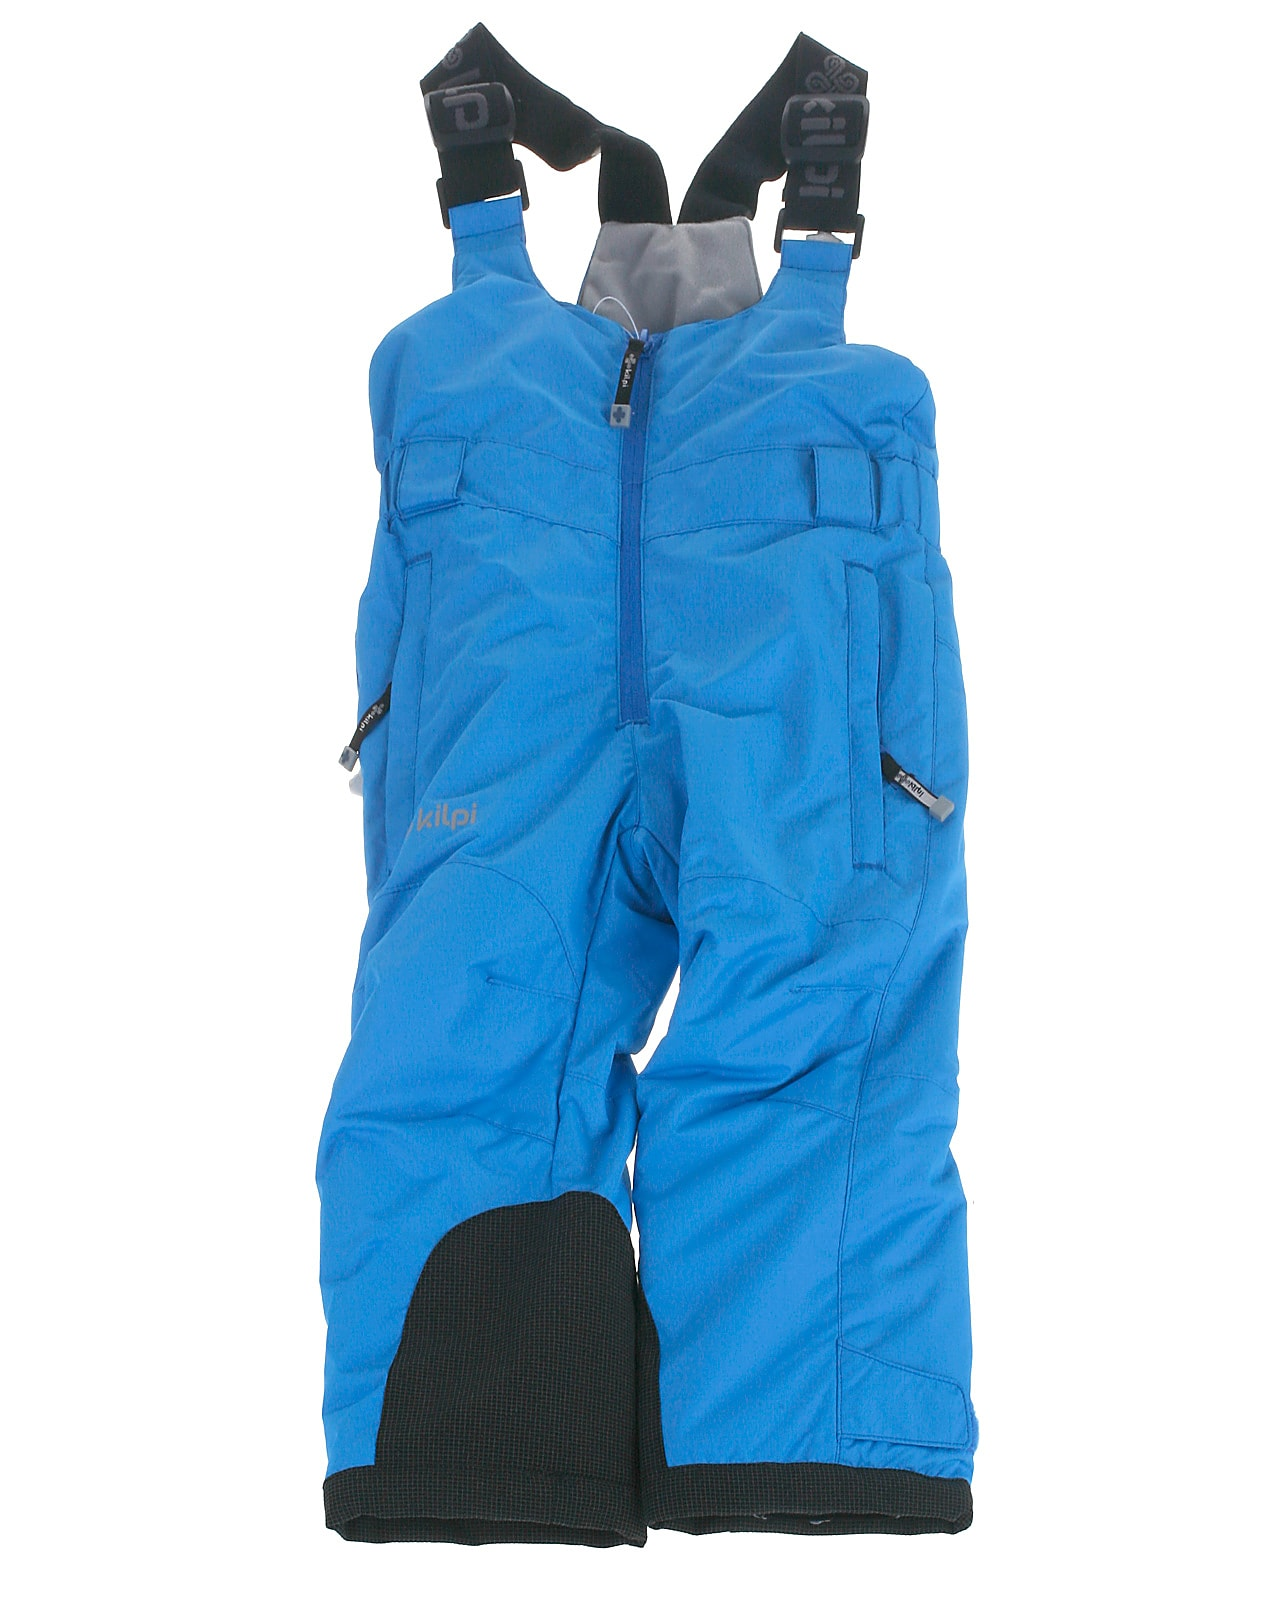 Kilpi skibukser, Daryl, blu